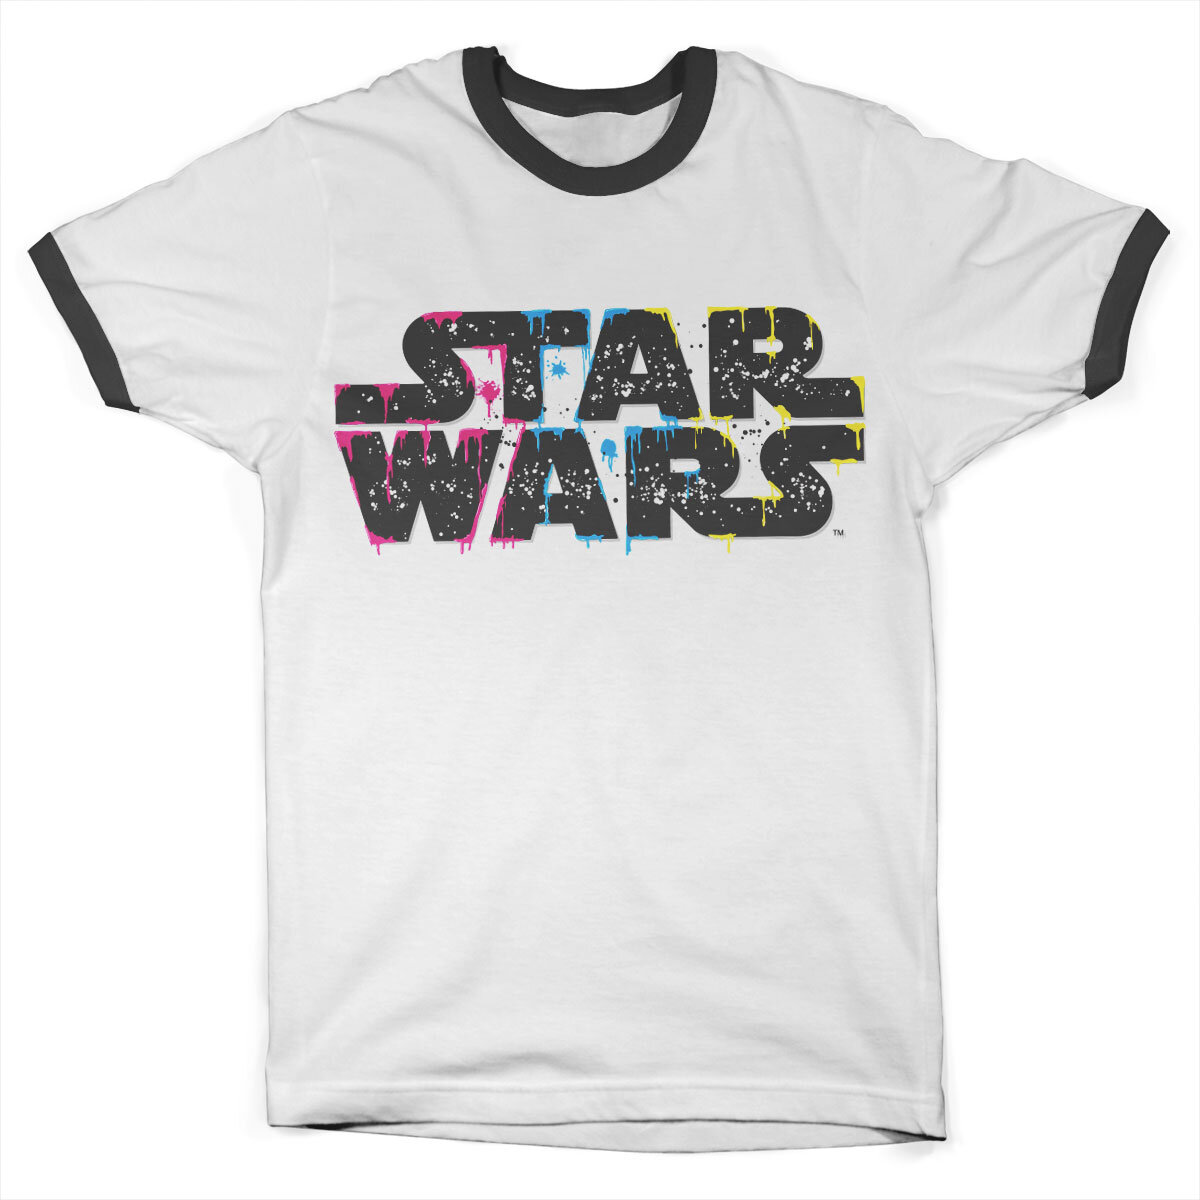 Inked Star Wars Logo Ringer Tee